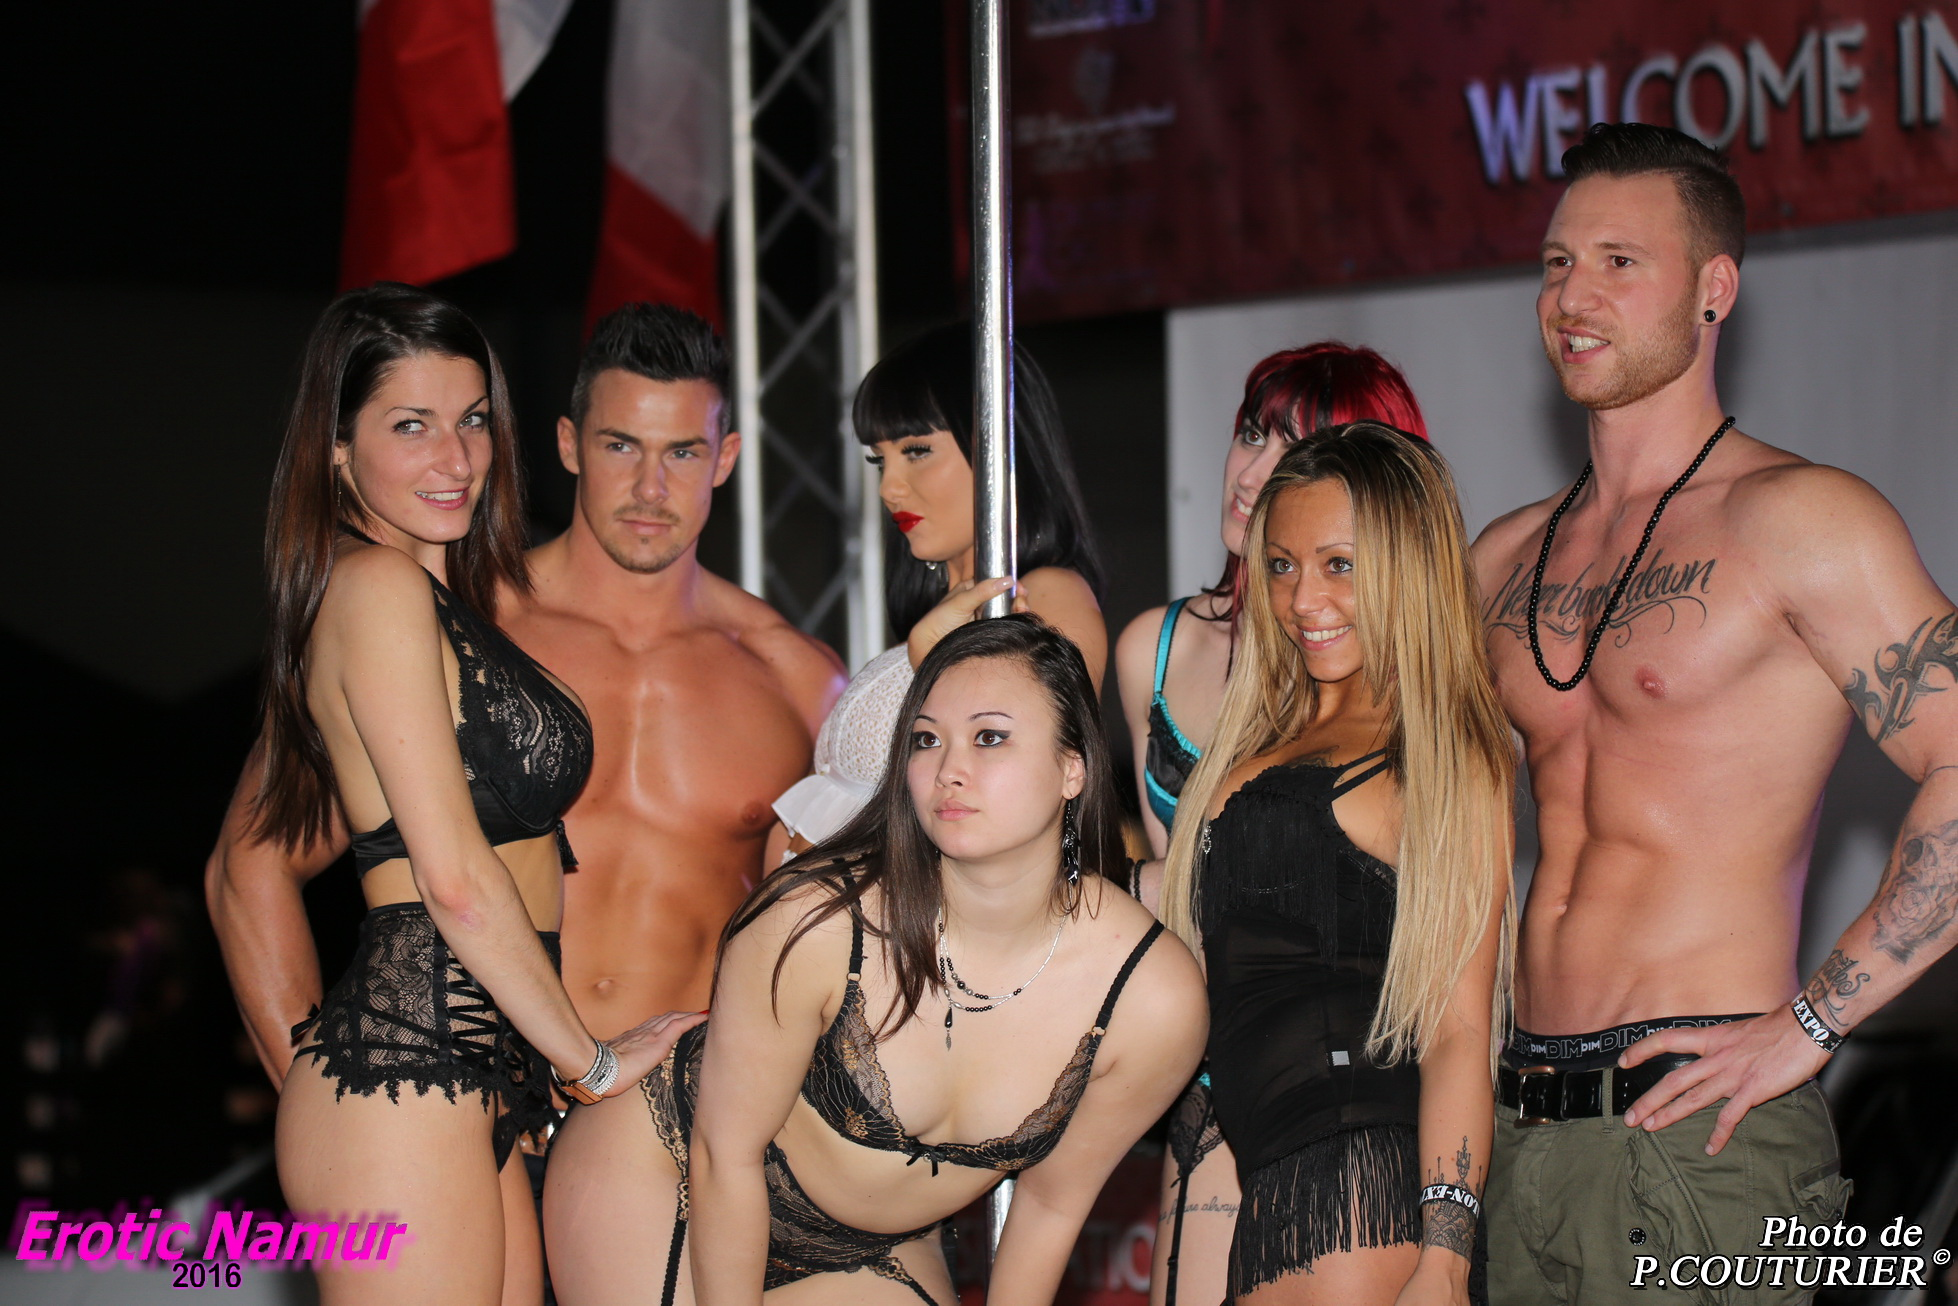 Erotic Show à Libramont 2016